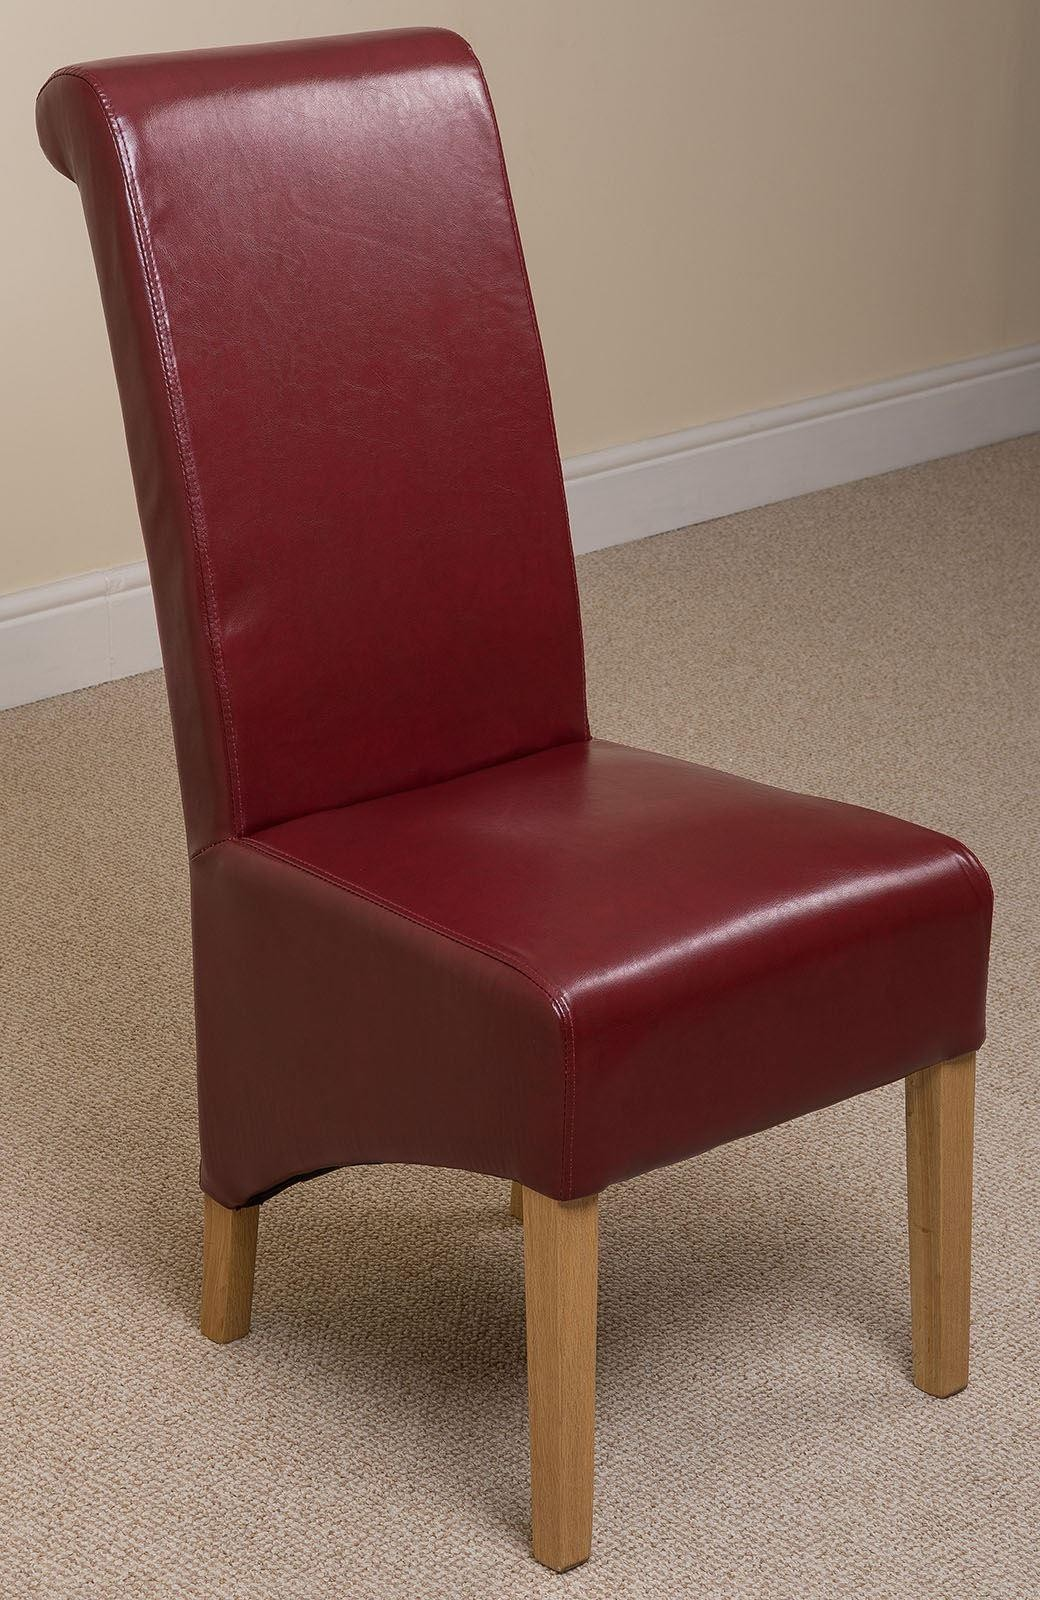 Montana Dining Chair Burgundy Leather Modern Furniture